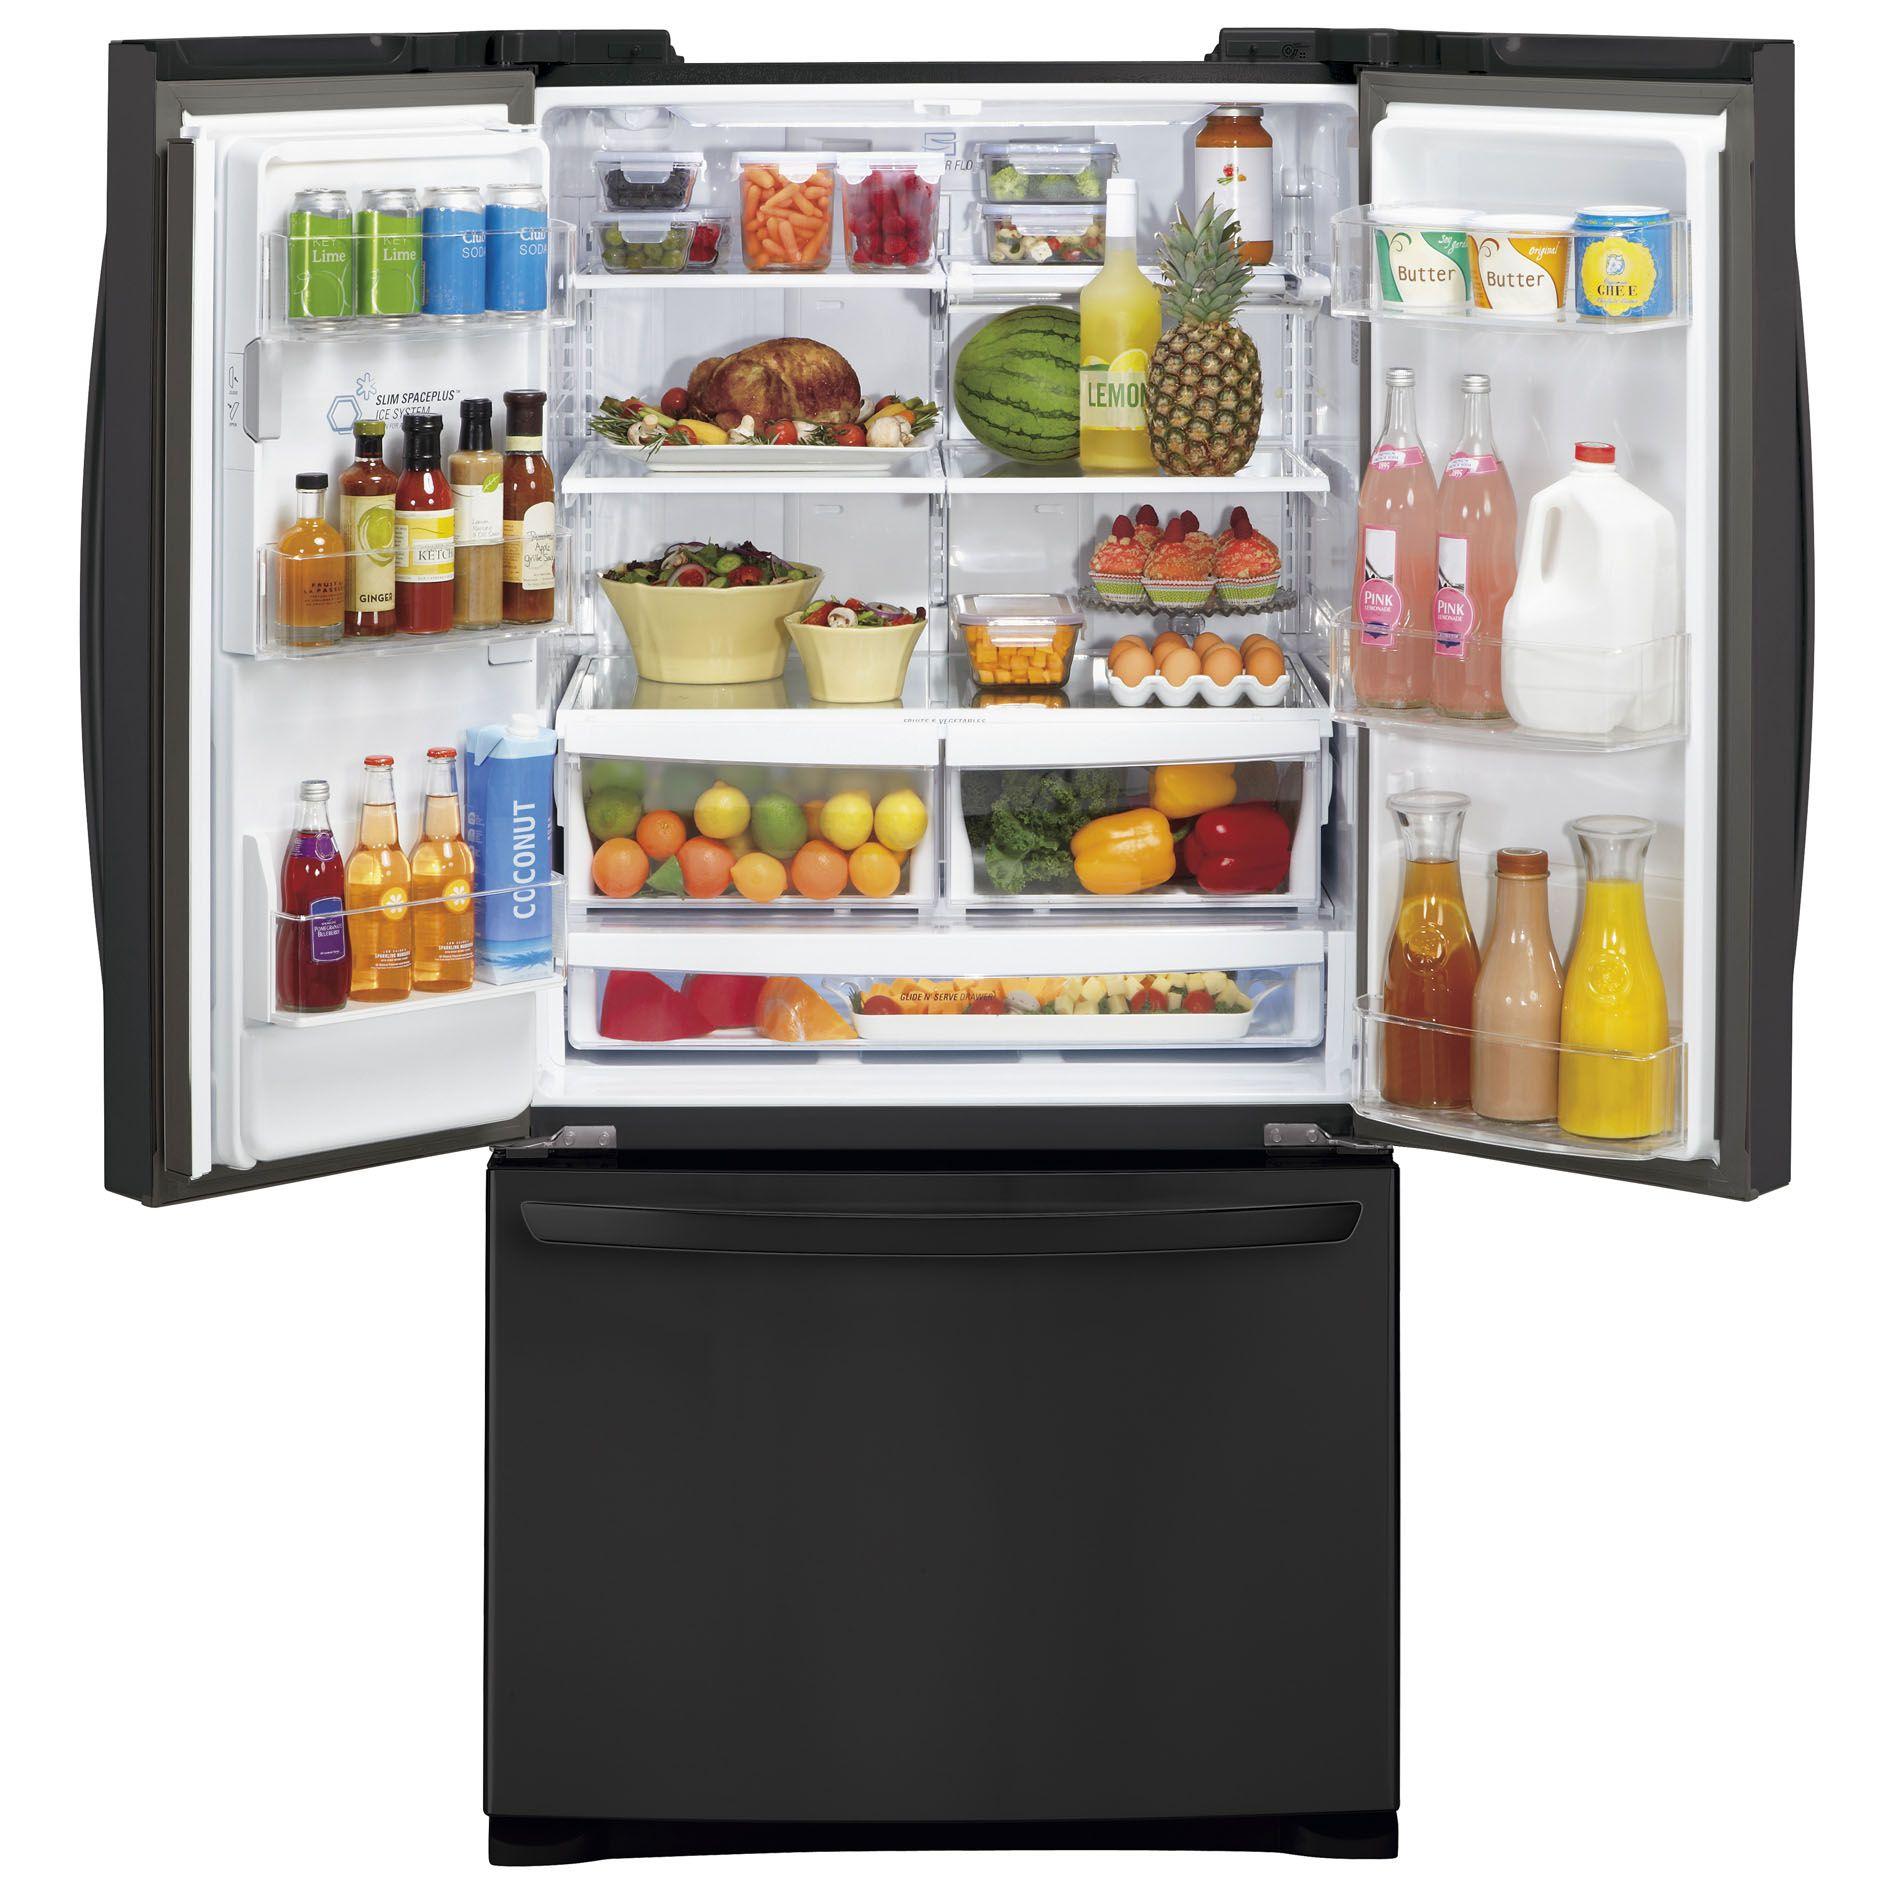 LG 27 cu. ft.  French Door Bottom-Freezer Refrigerator - Black